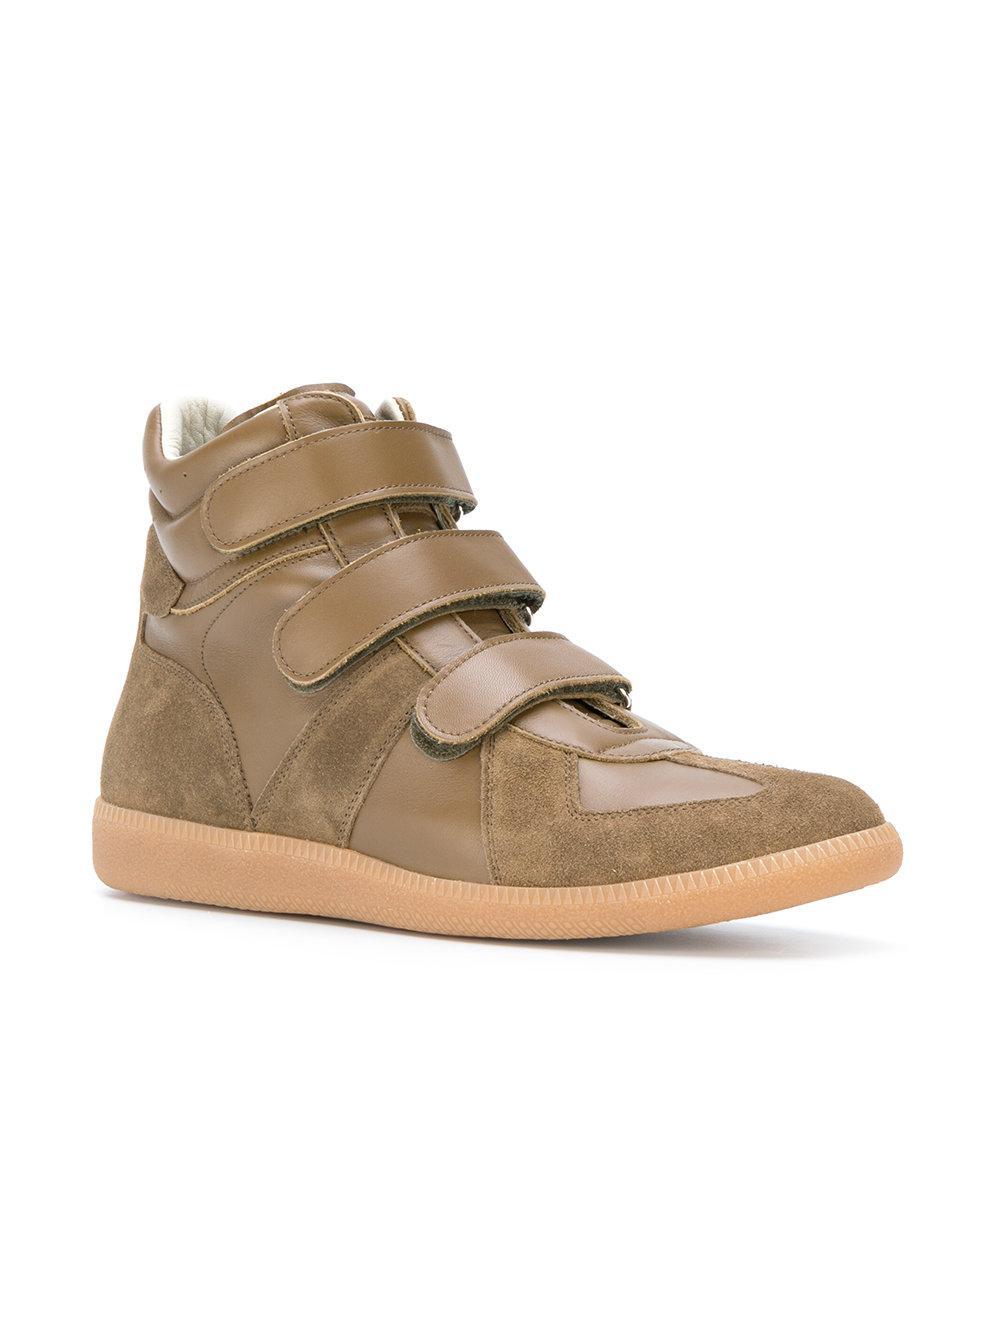 137c9beef0 Lyst - Maison Margiela Replica Multi-strap Sneakers in Natural for Men